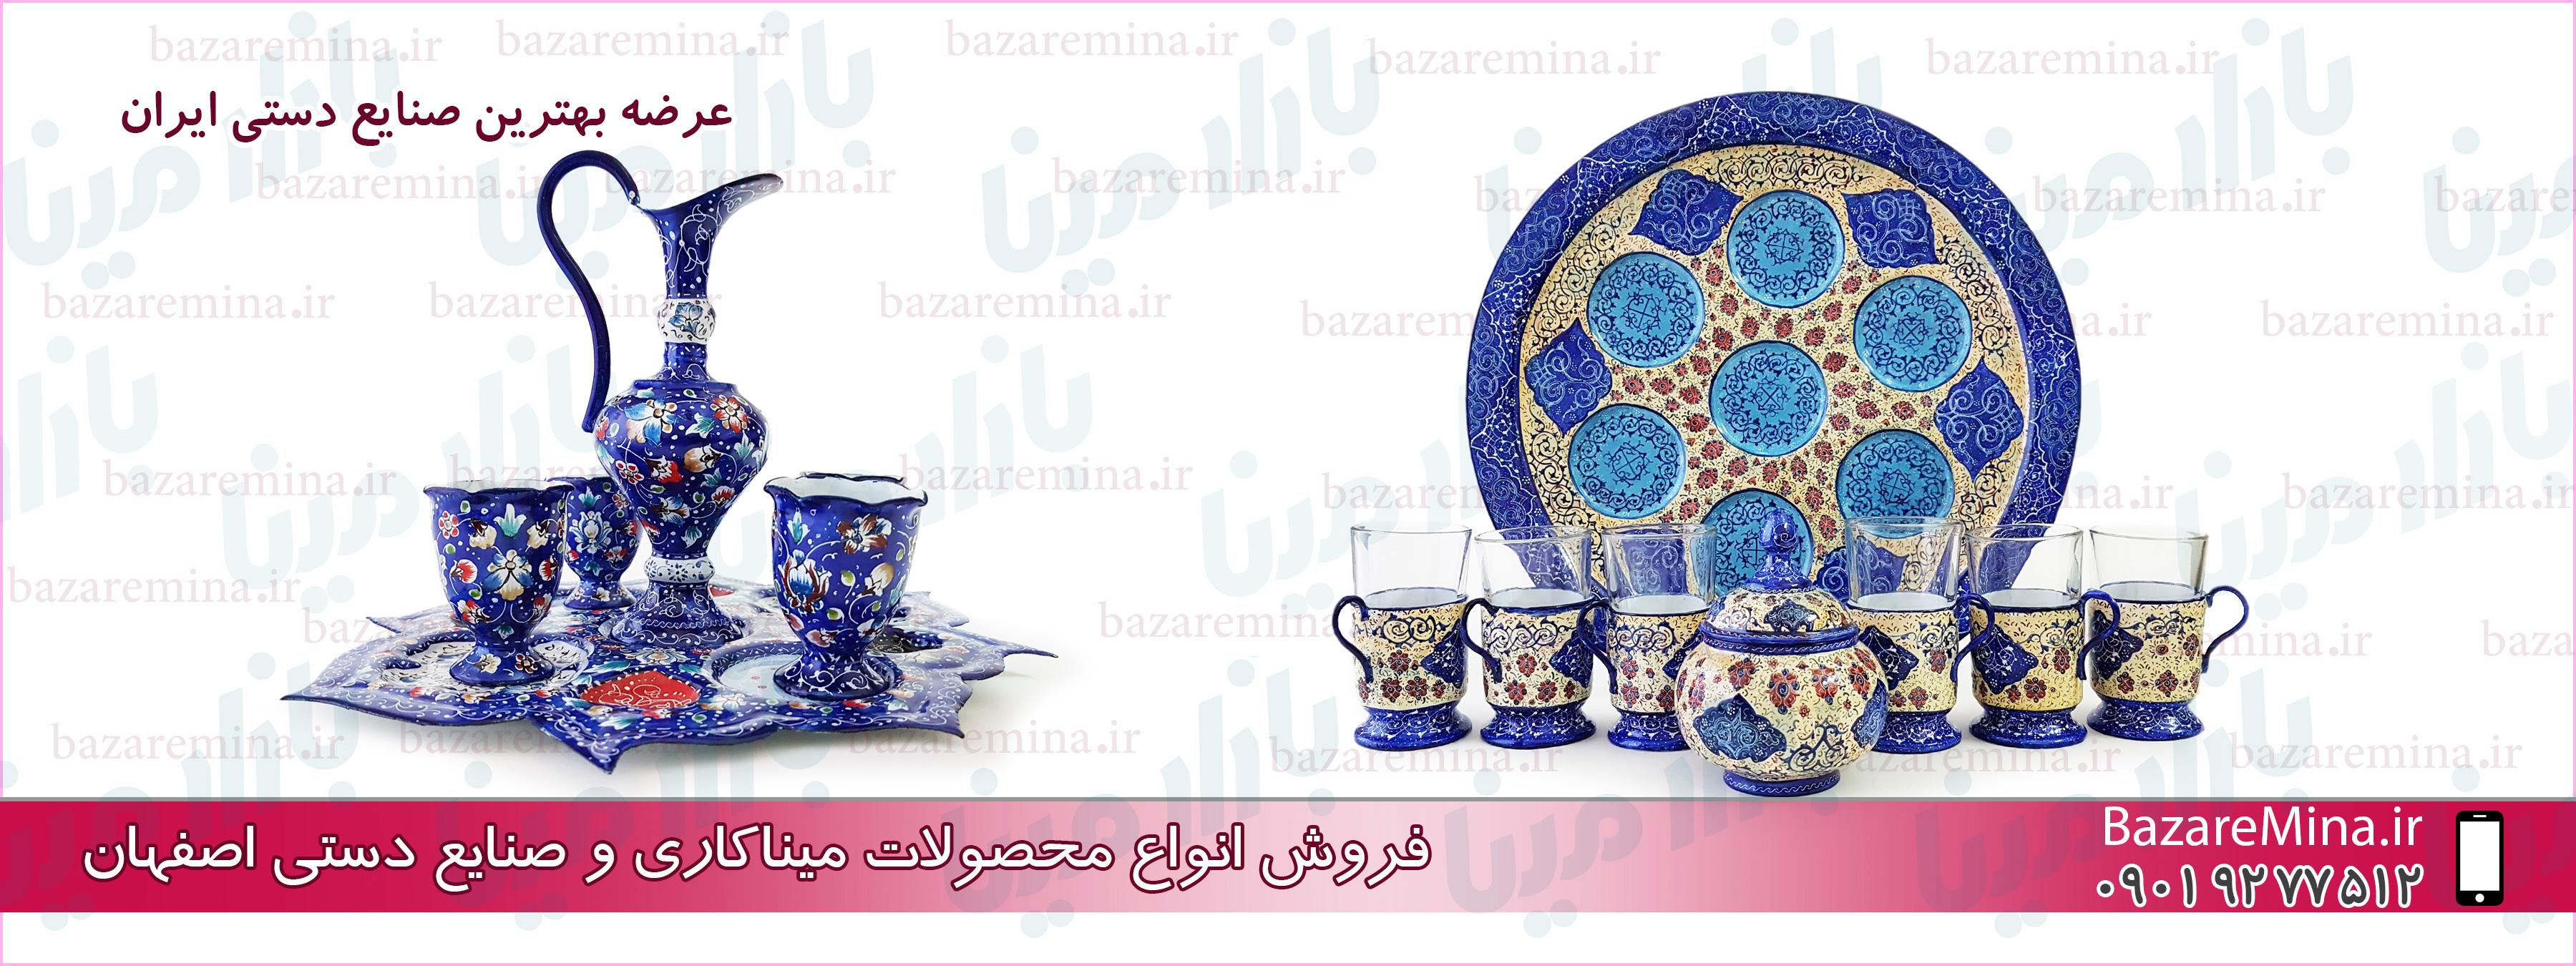 ظروف میناکاری اصفهان